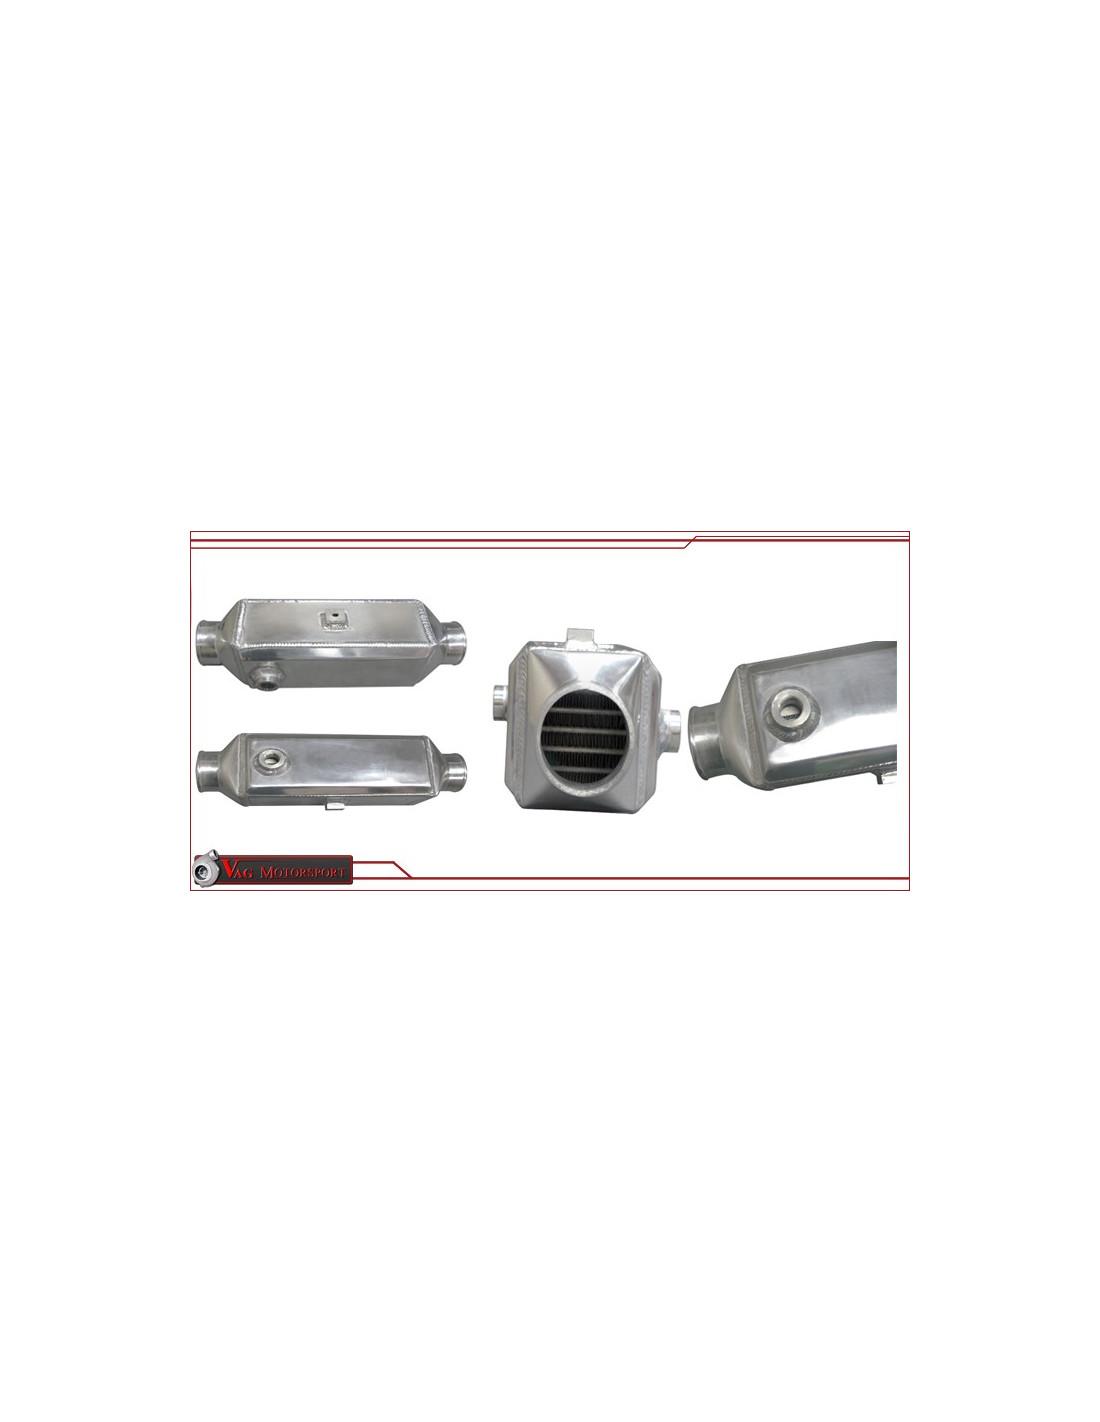 intercooler changeur air eau type1. Black Bedroom Furniture Sets. Home Design Ideas